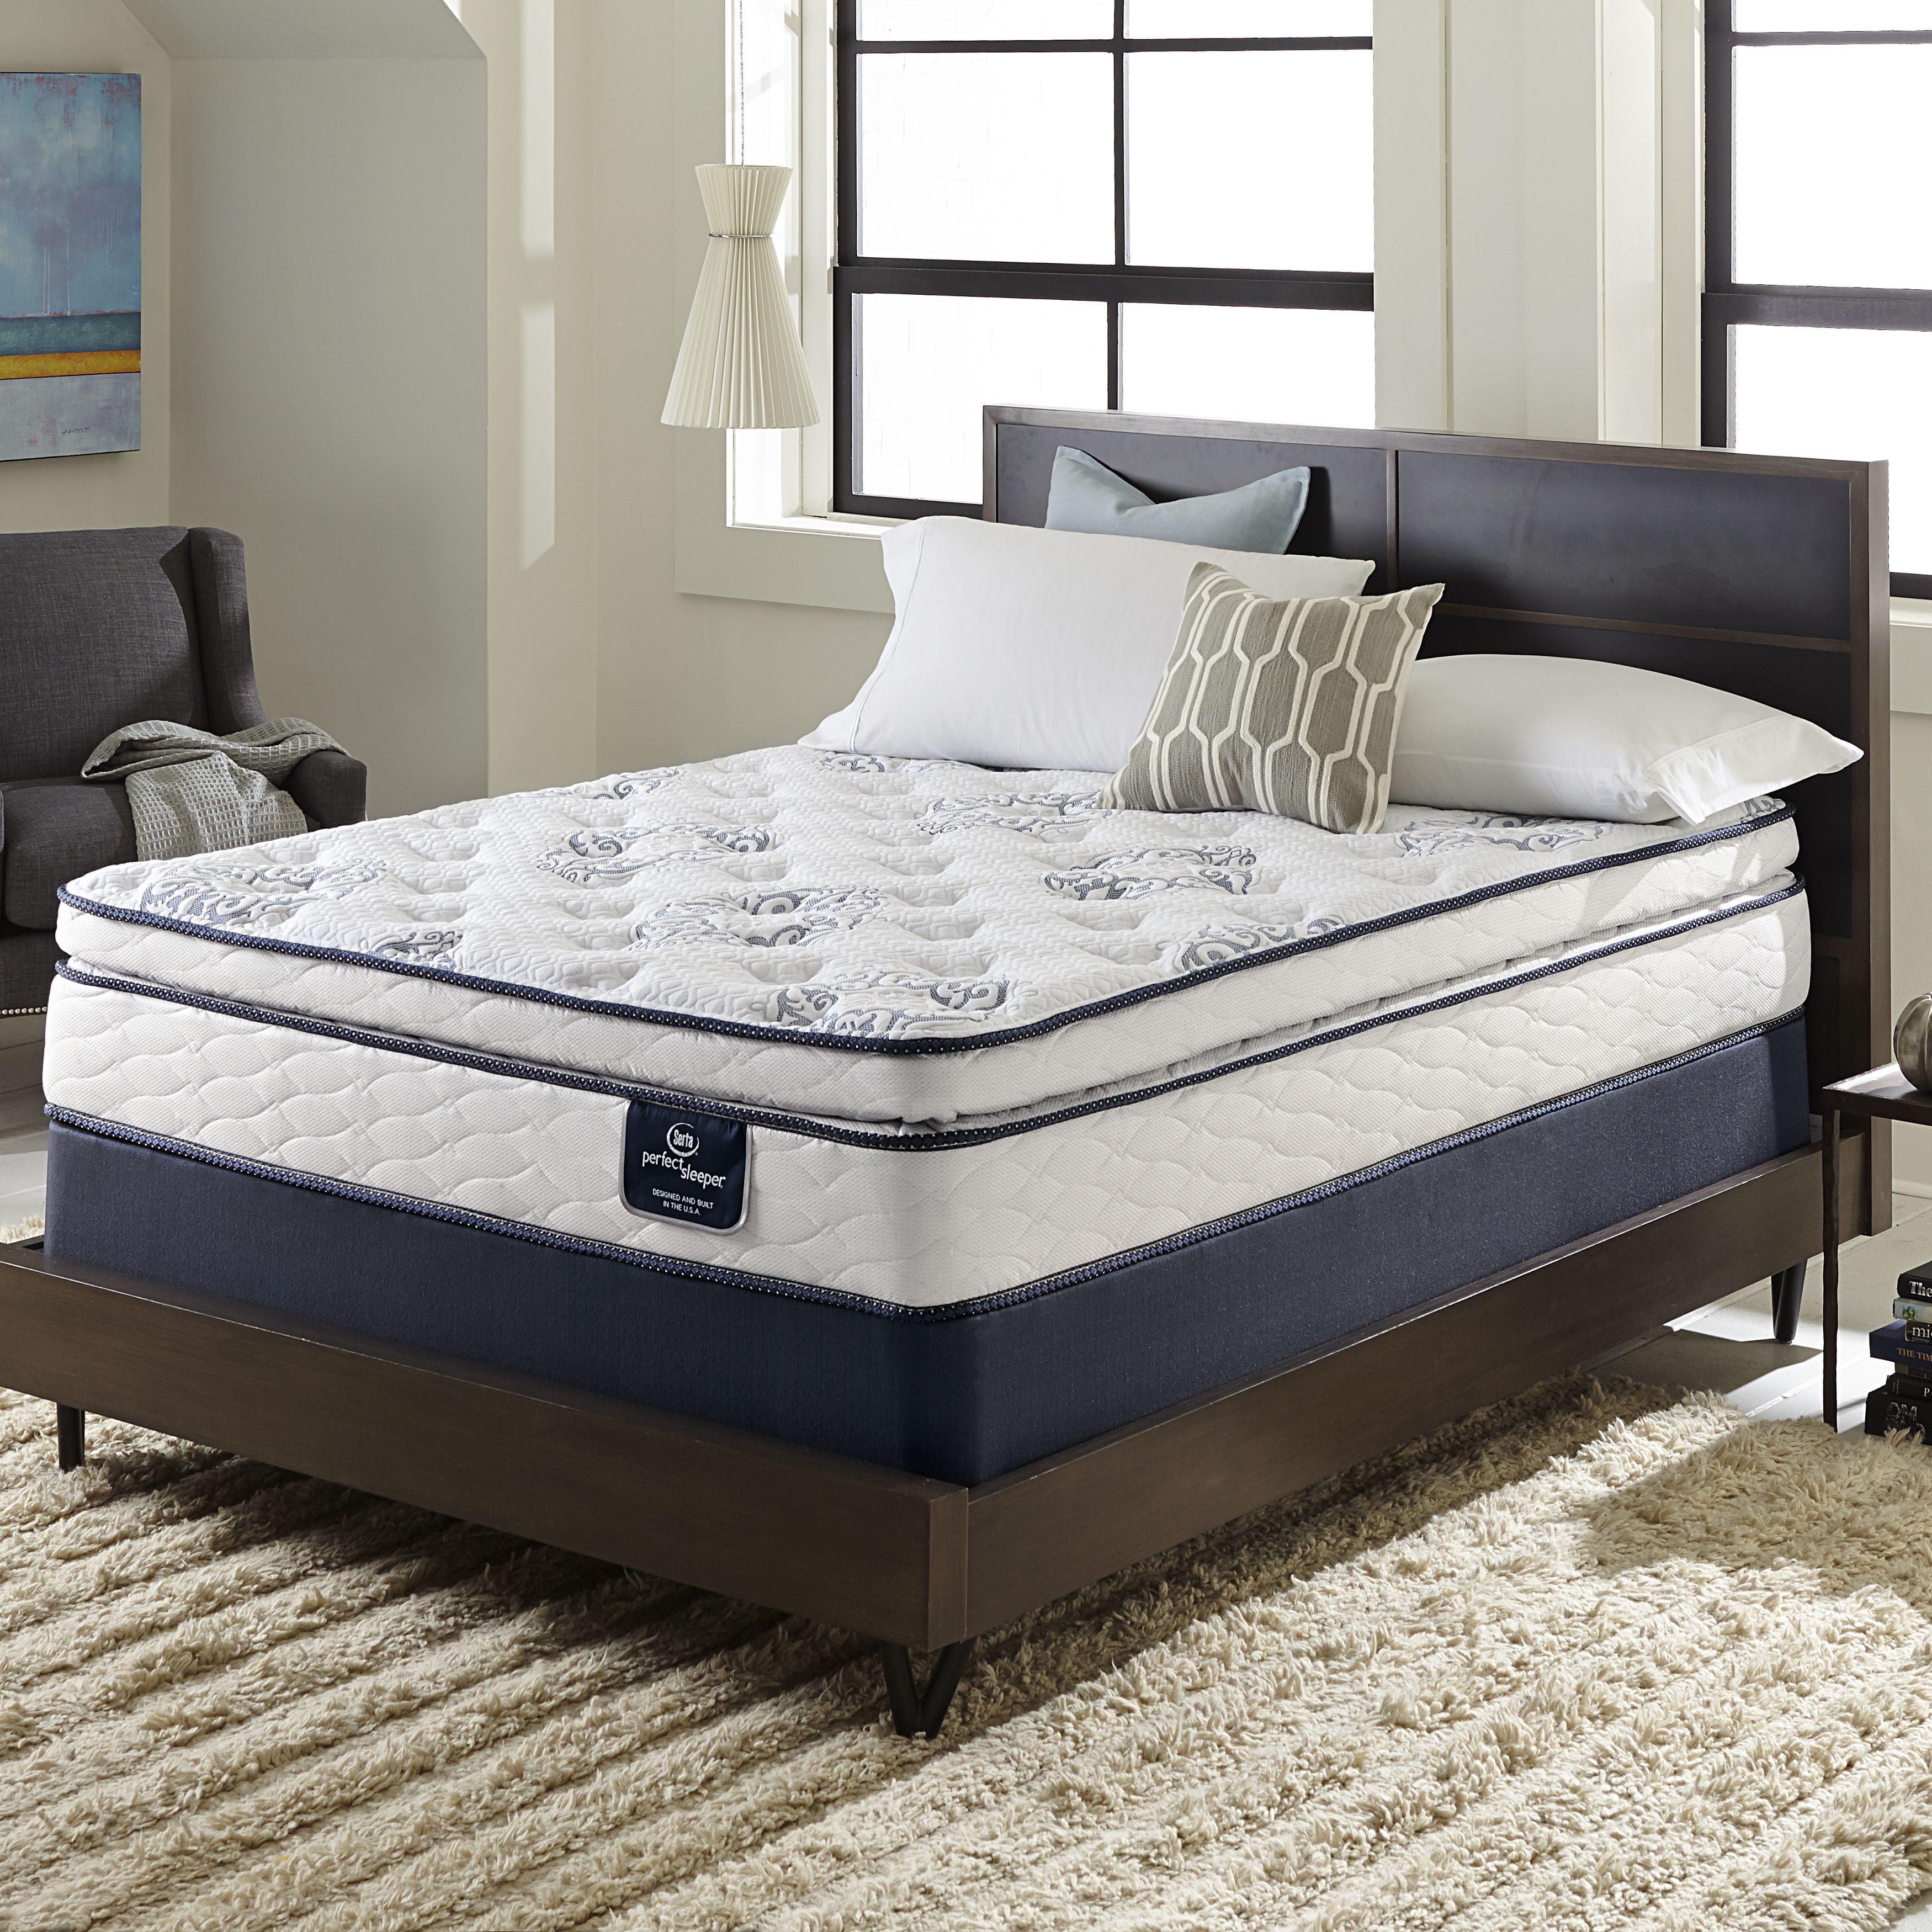 Serta Perfect Sleeper 13 75 Inch Kleinmon Ii Pillow Top Plush